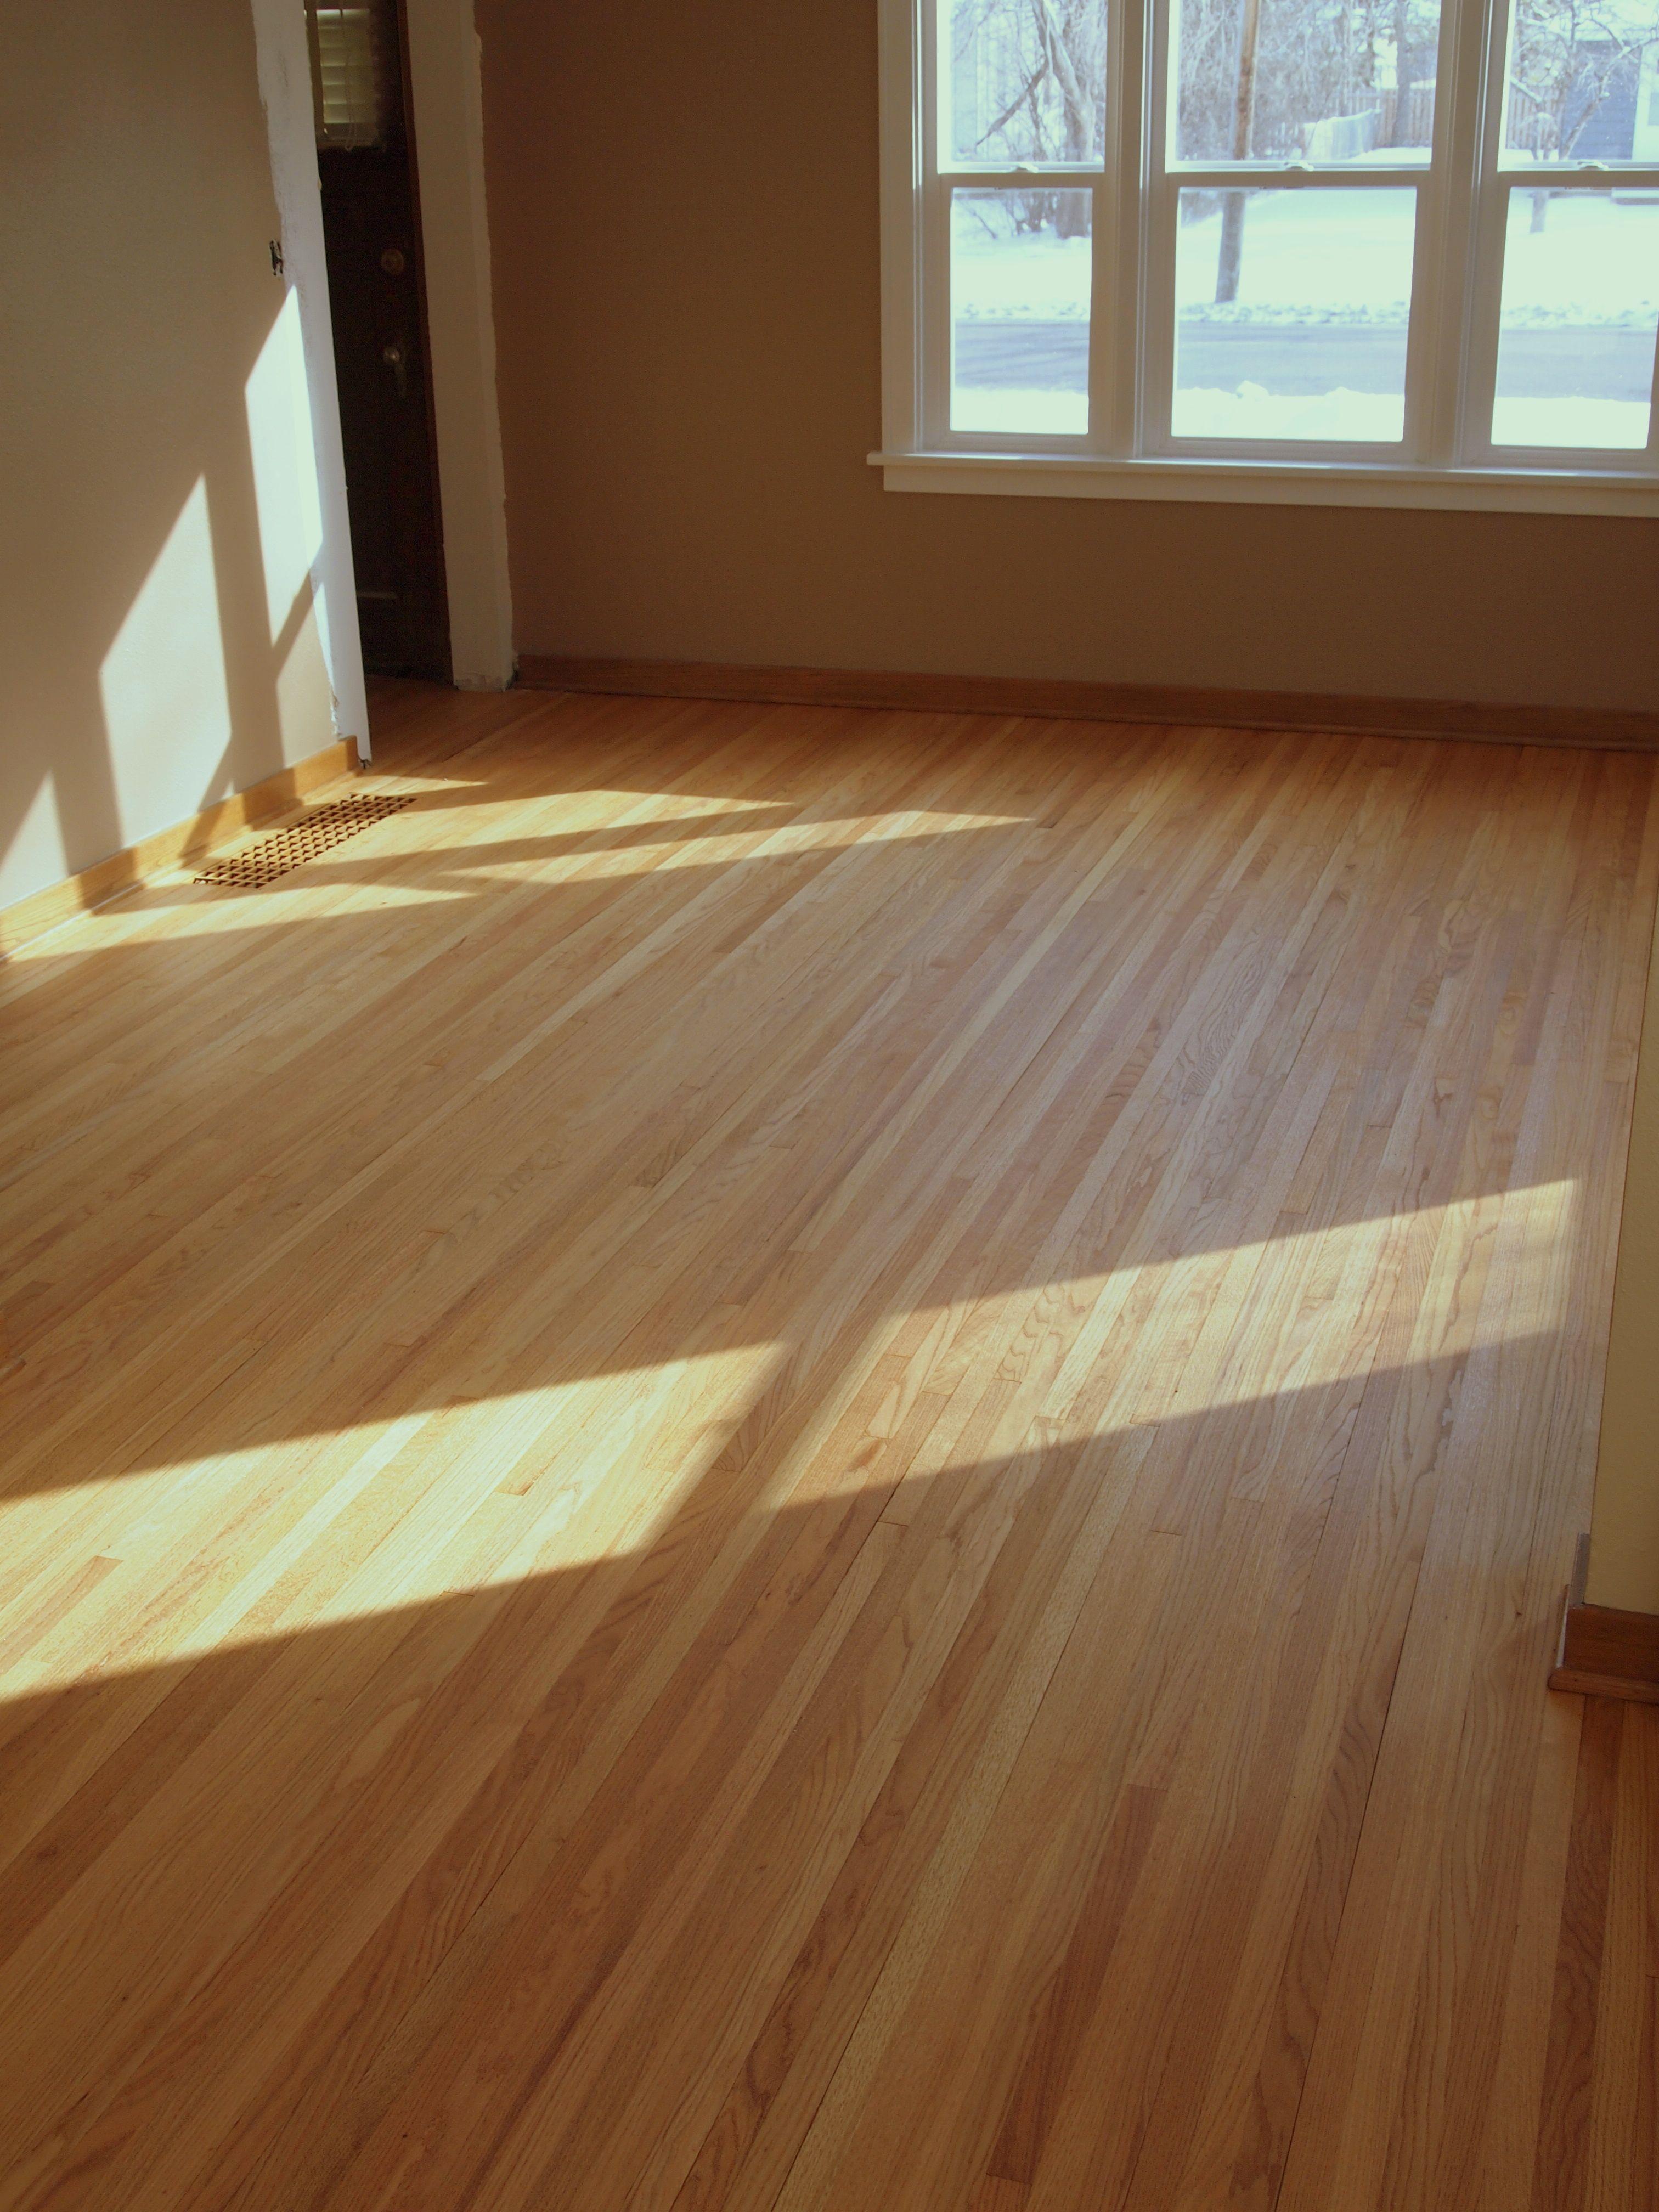 Linoleum Flooring  There Wood Floors in Your House Fargo